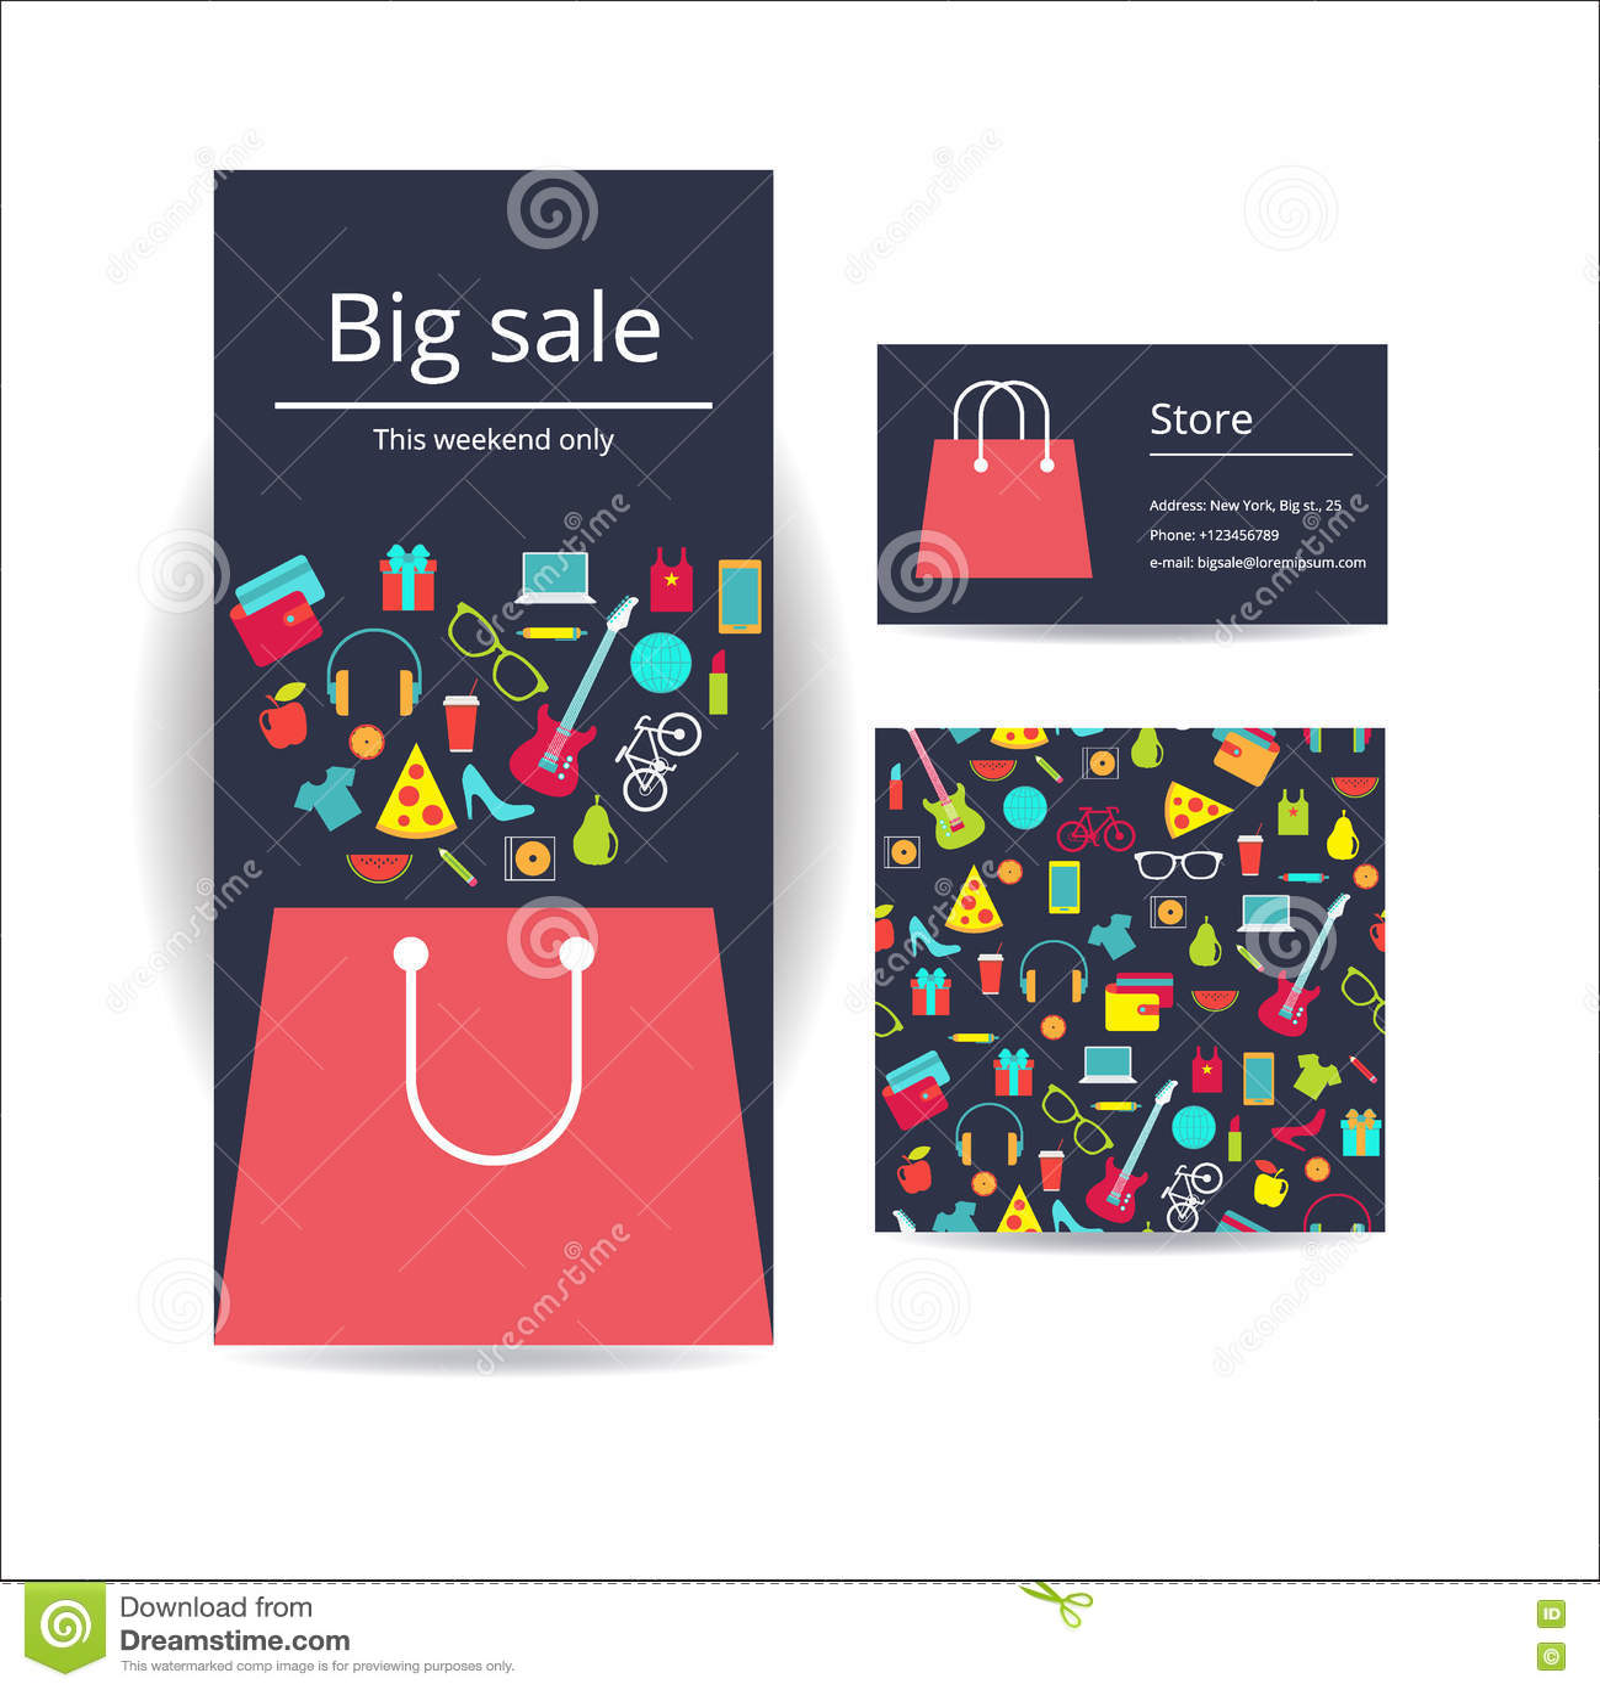 Business brochure flyer banner business card and card with seam business brochure flyer banner business card and card with seam magicingreecefo Images